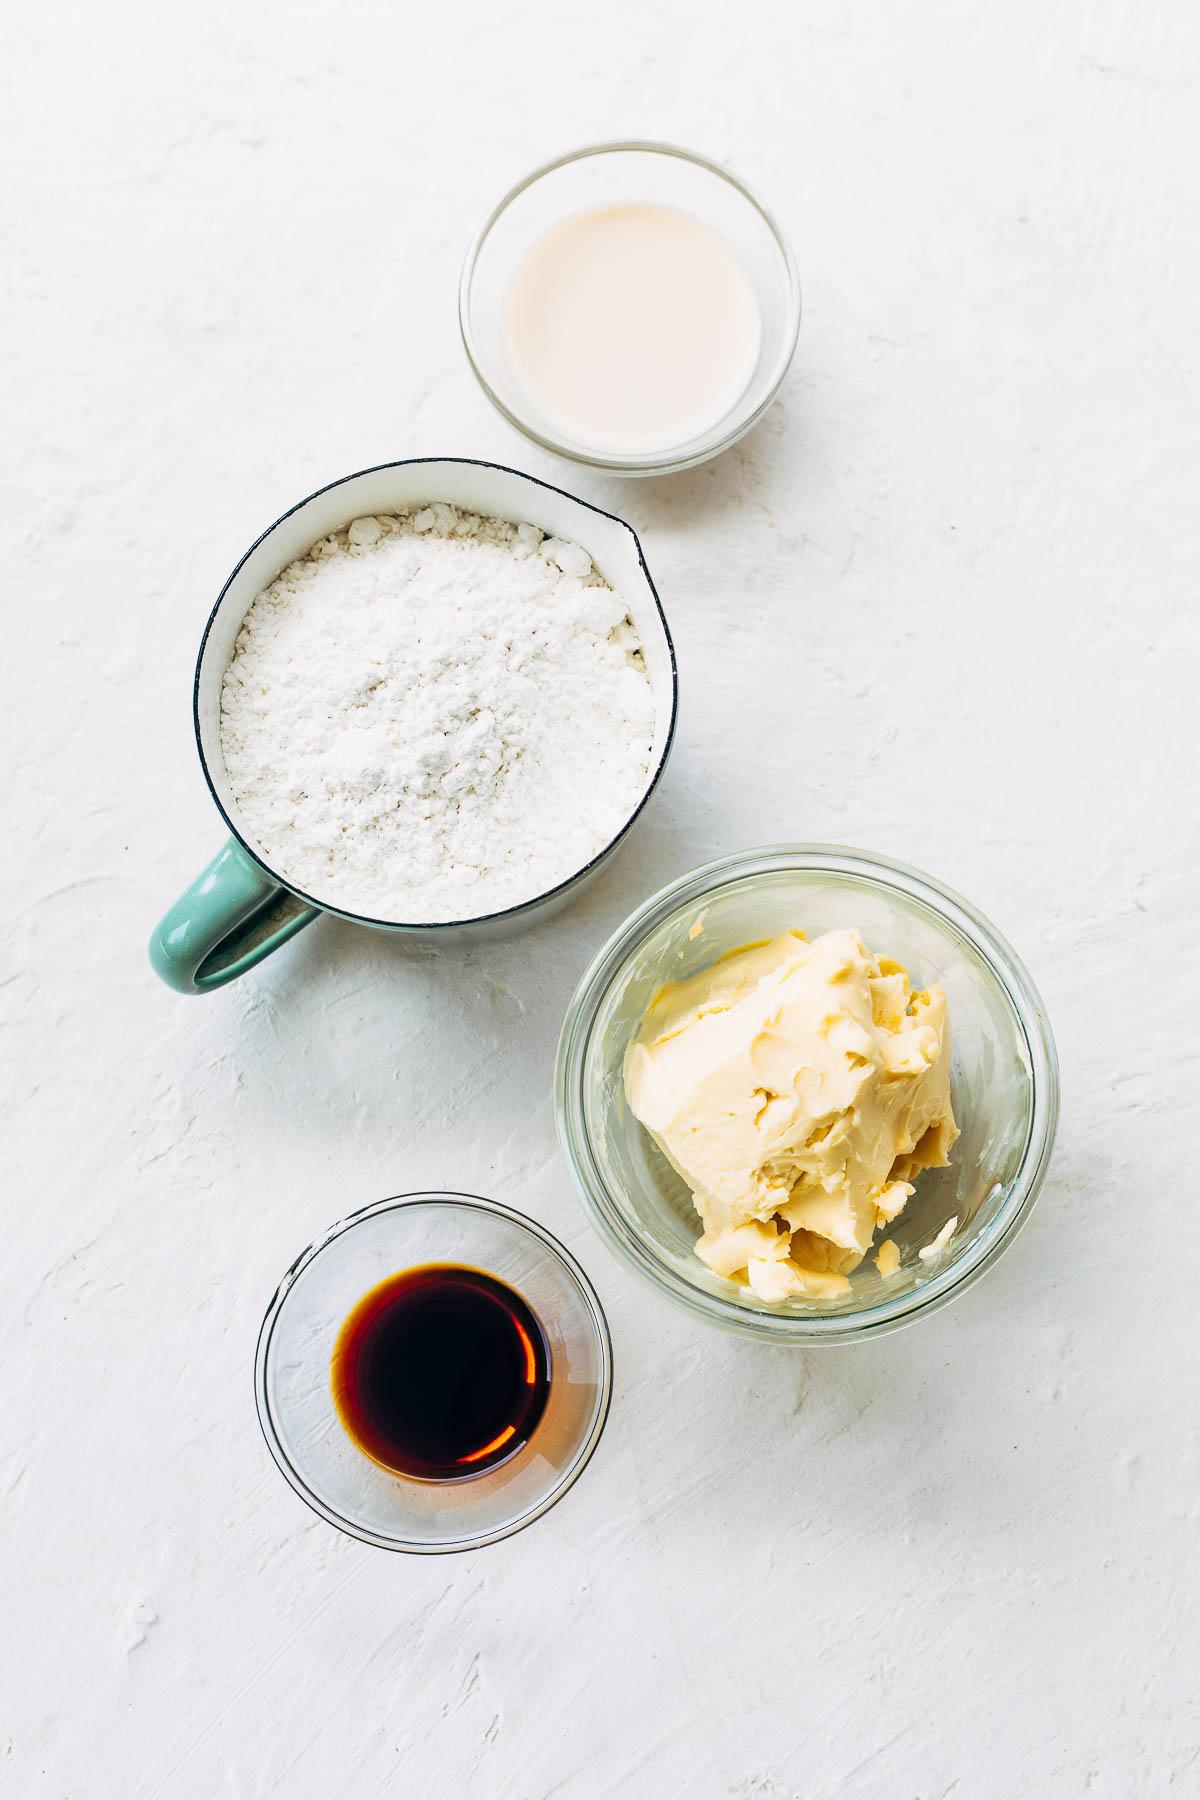 Ingredients for vegan buttecream: nondairy milk, vegan butter, vanilla, and icing sugar.